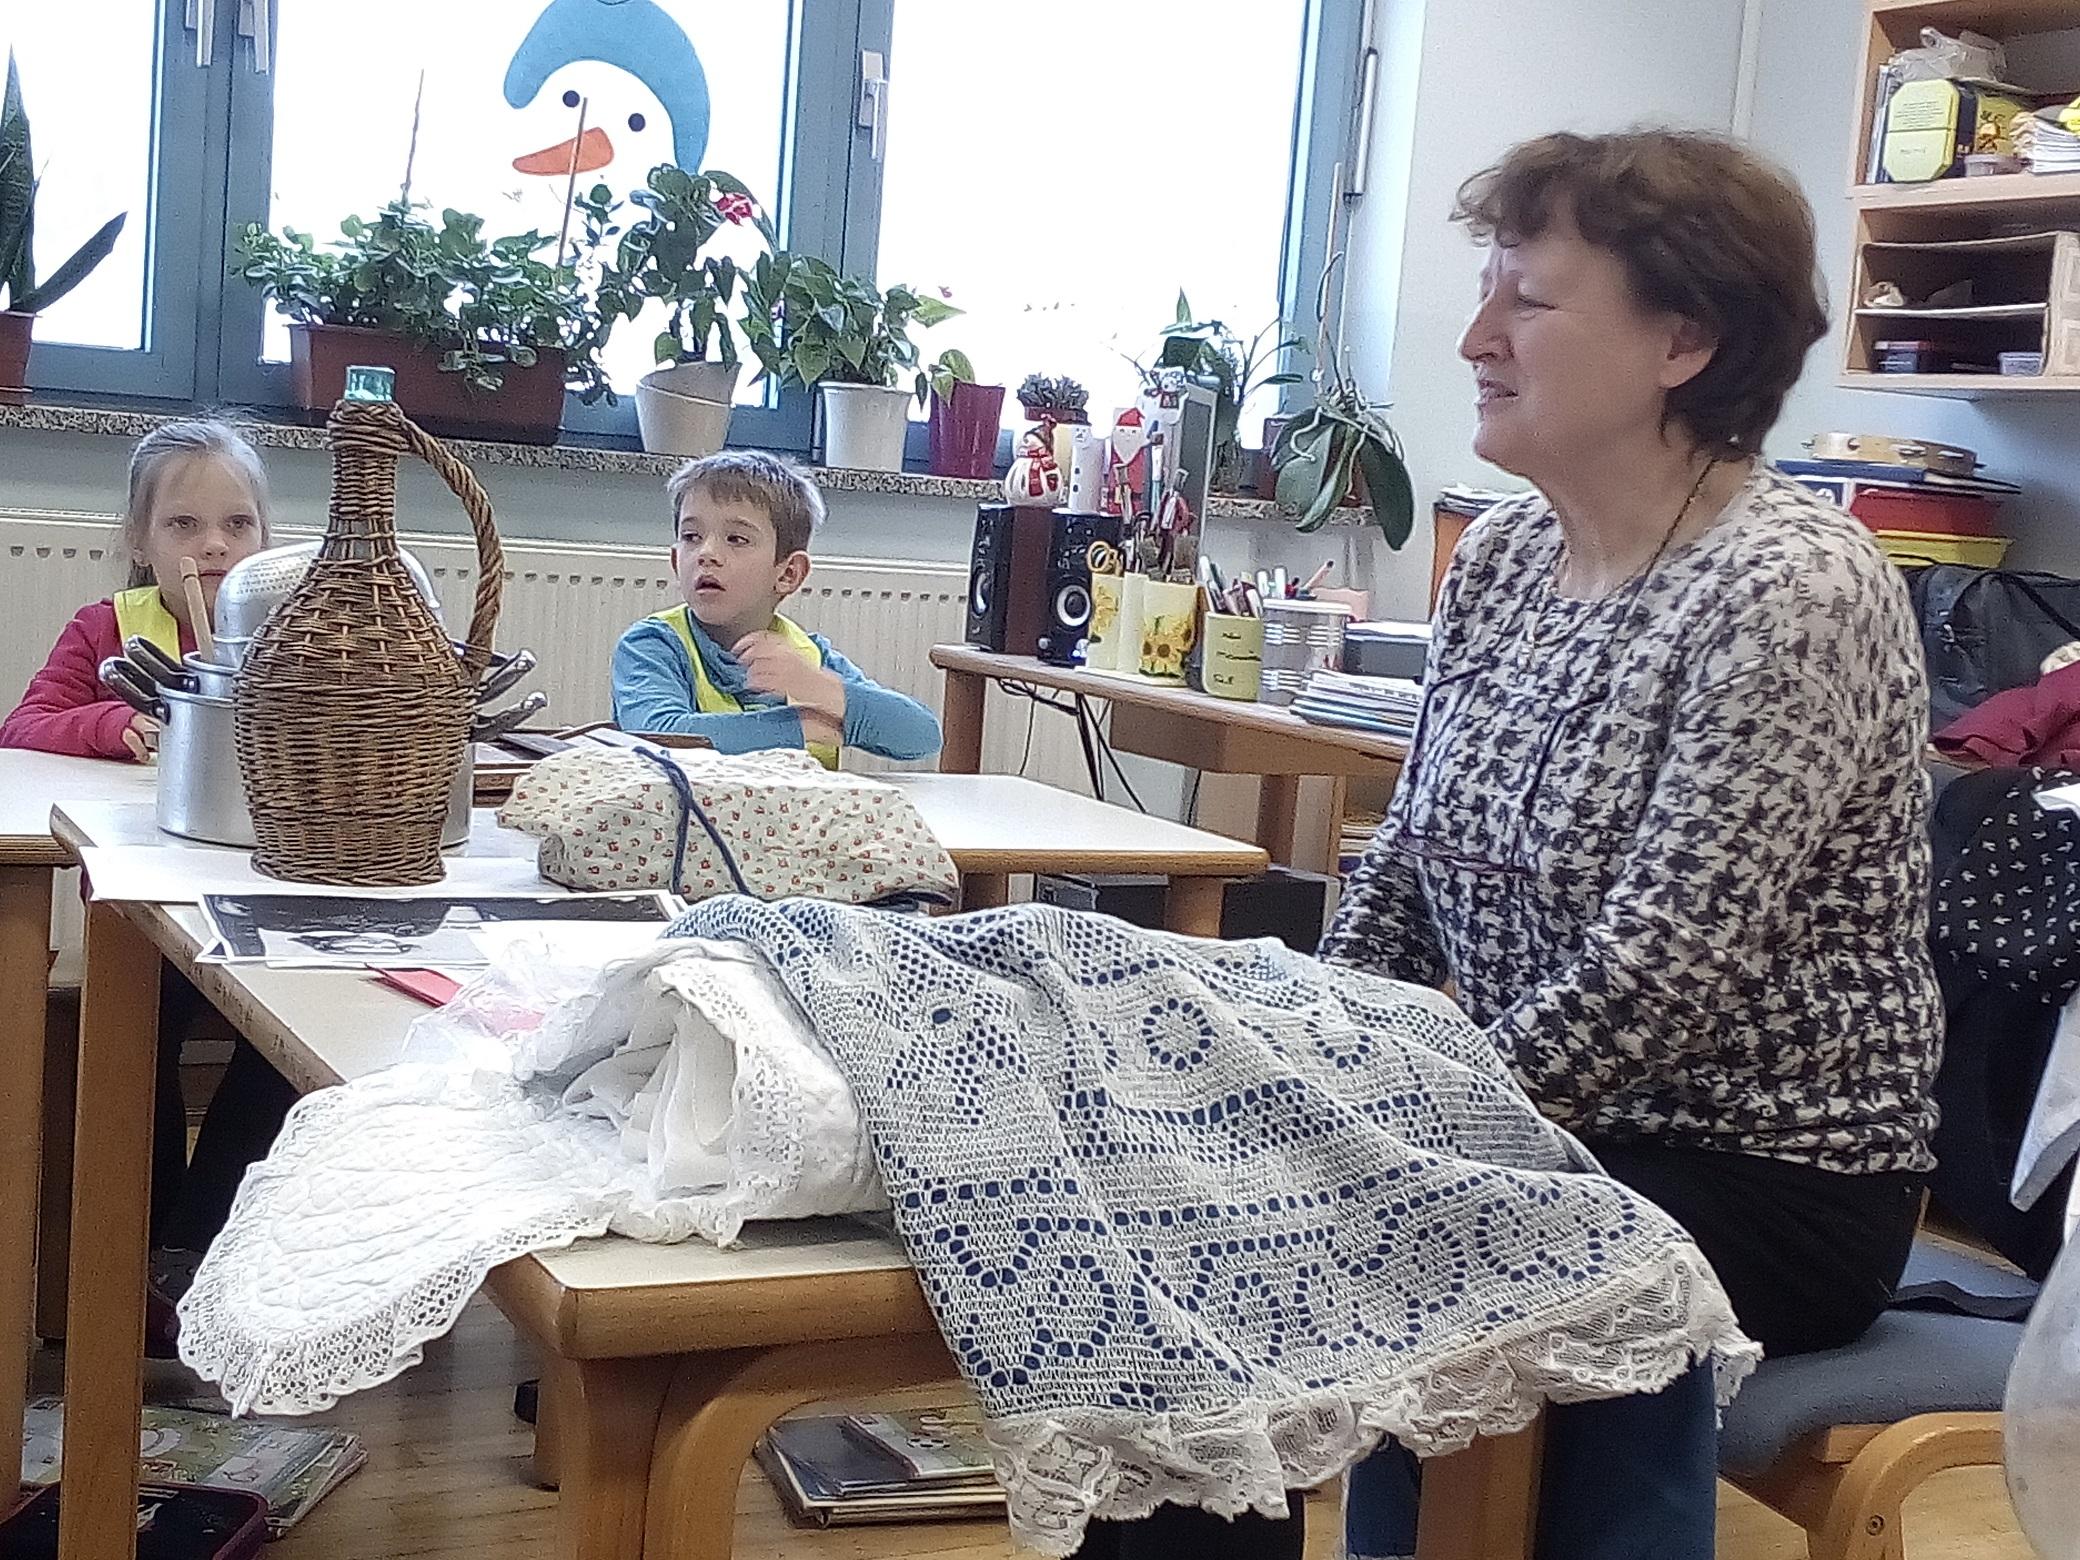 Zgodovinarka Lilijan Vidrih Lavrenčič na obisku v Podnanosu - 6.2.2018 - foto Vida Trošt Vidic (6)